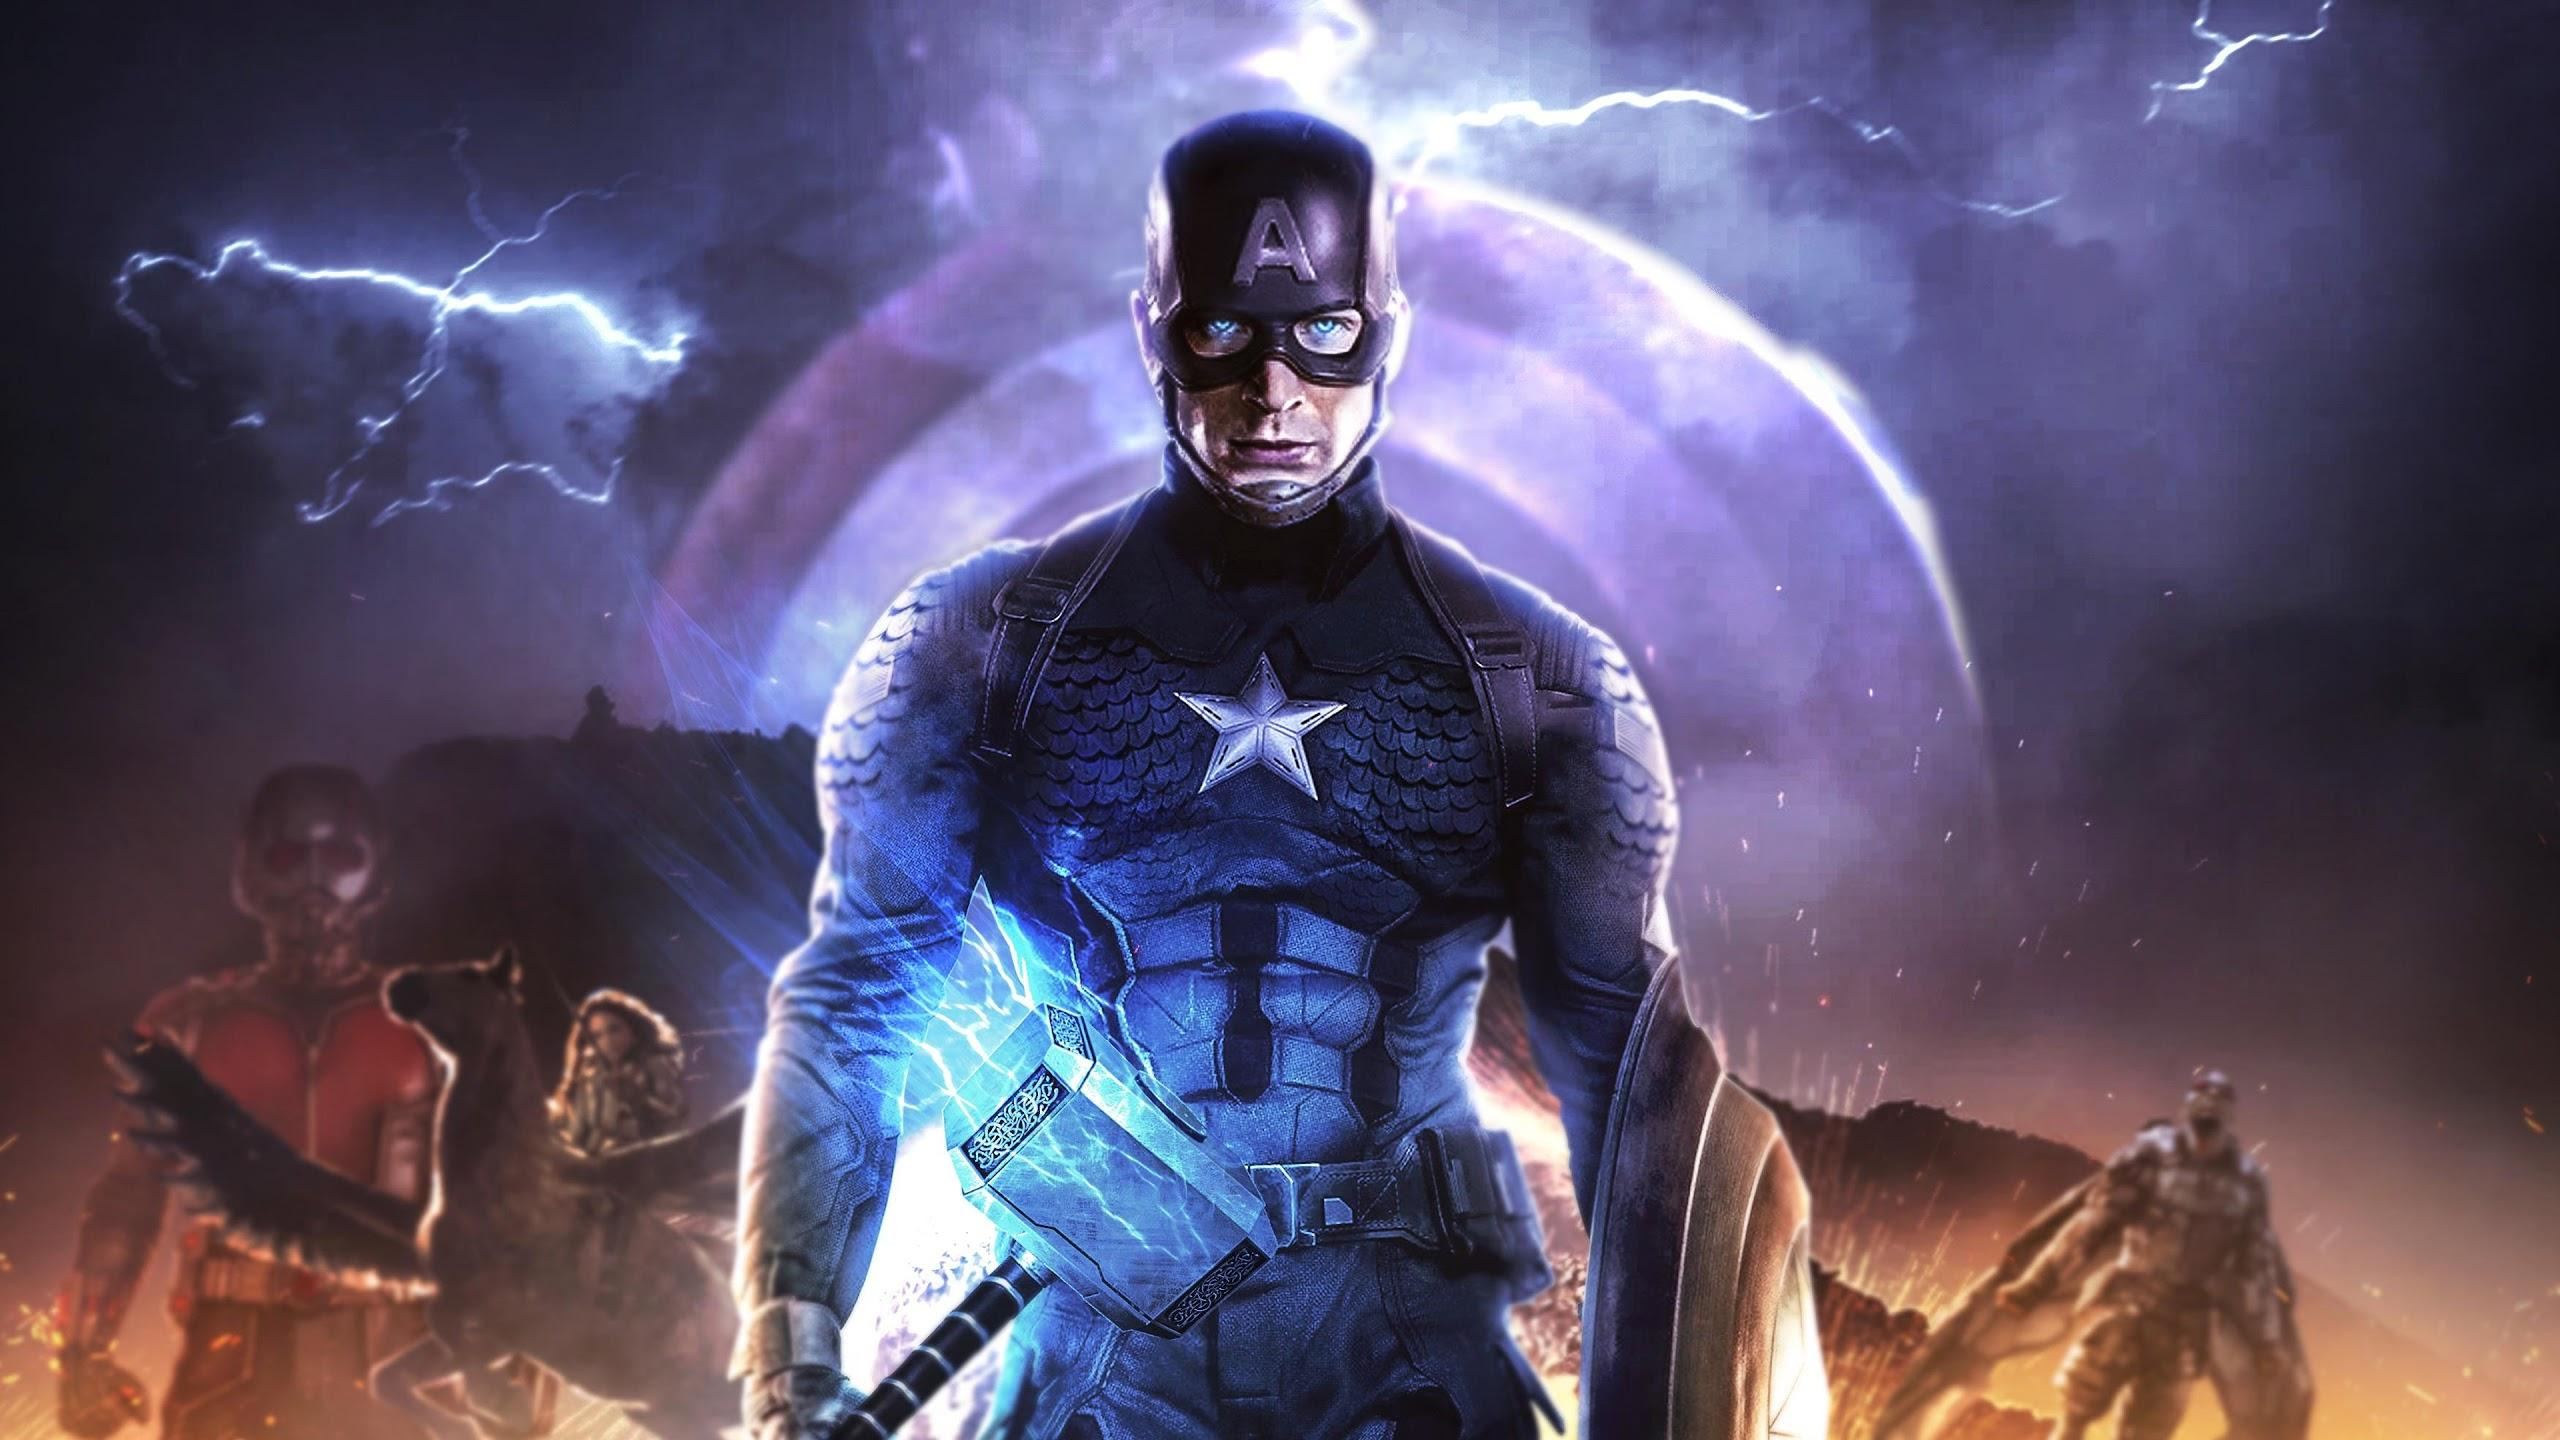 Captain America Hammer Wallpapers - Wallpaper Cave